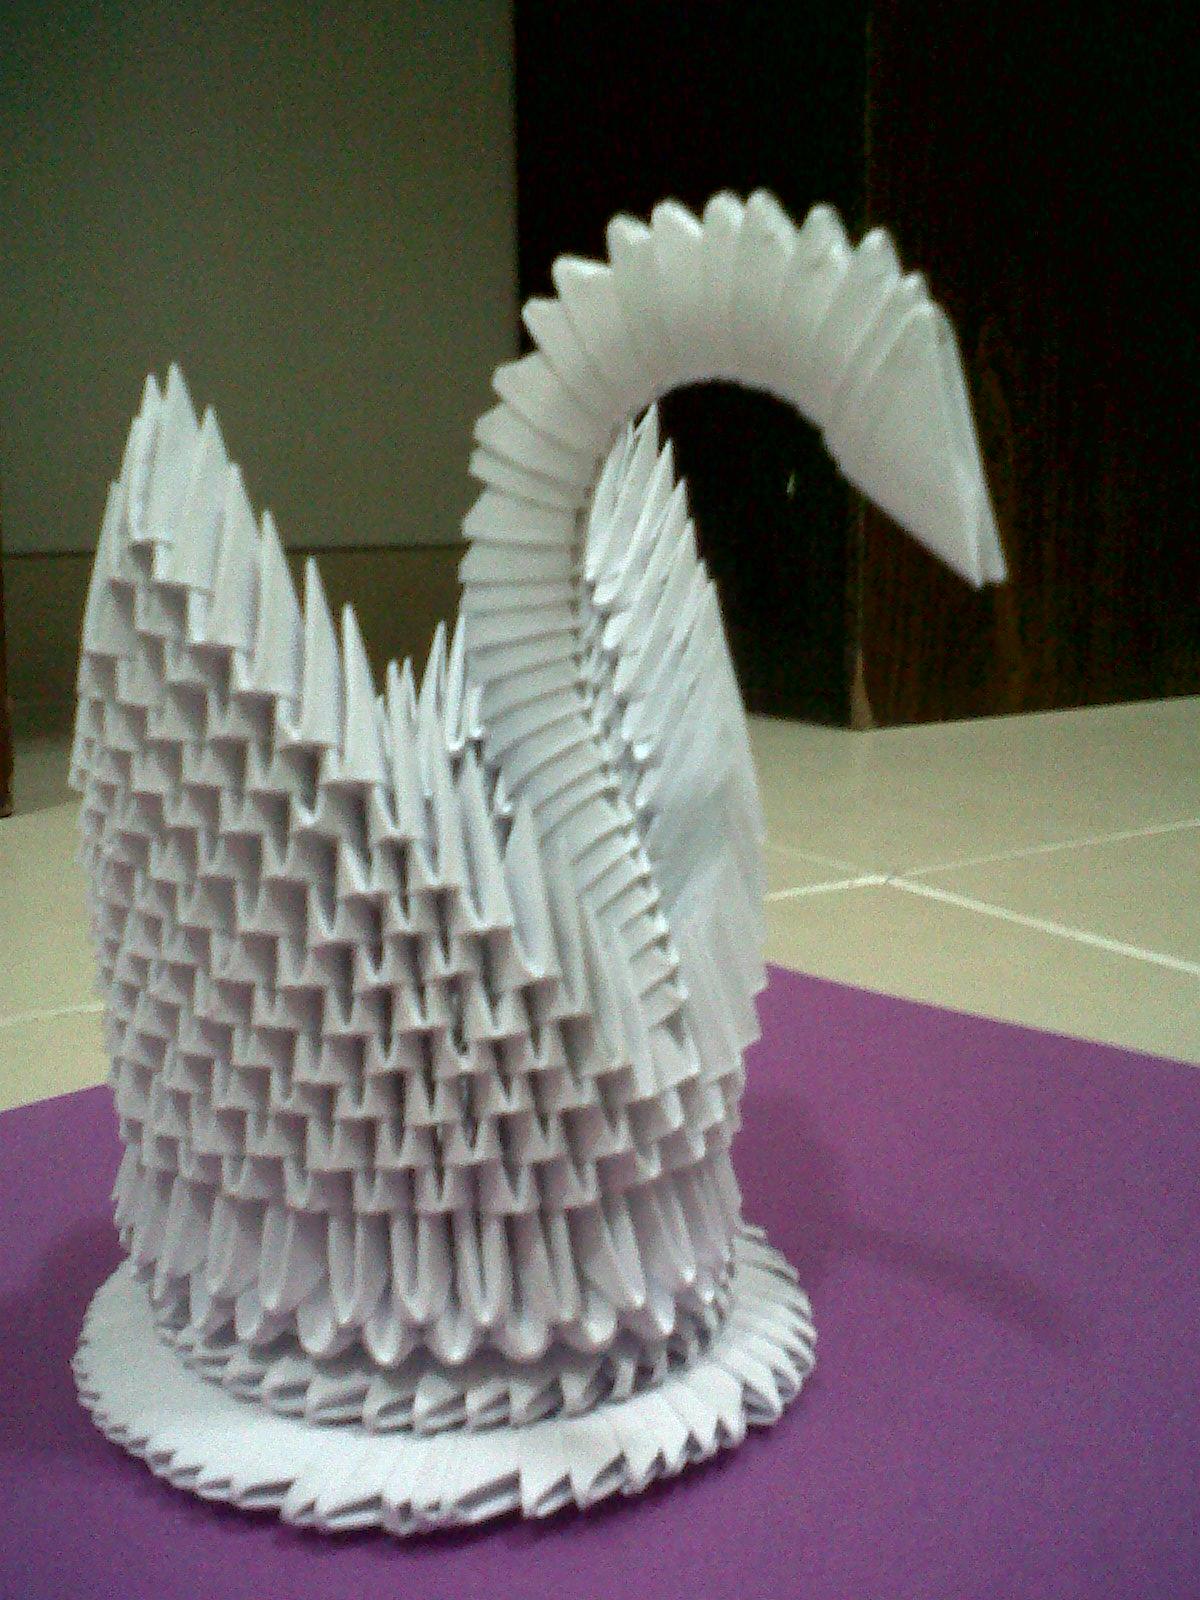 Elizabeth Arlene Quilled Creations 3d Origami Swan